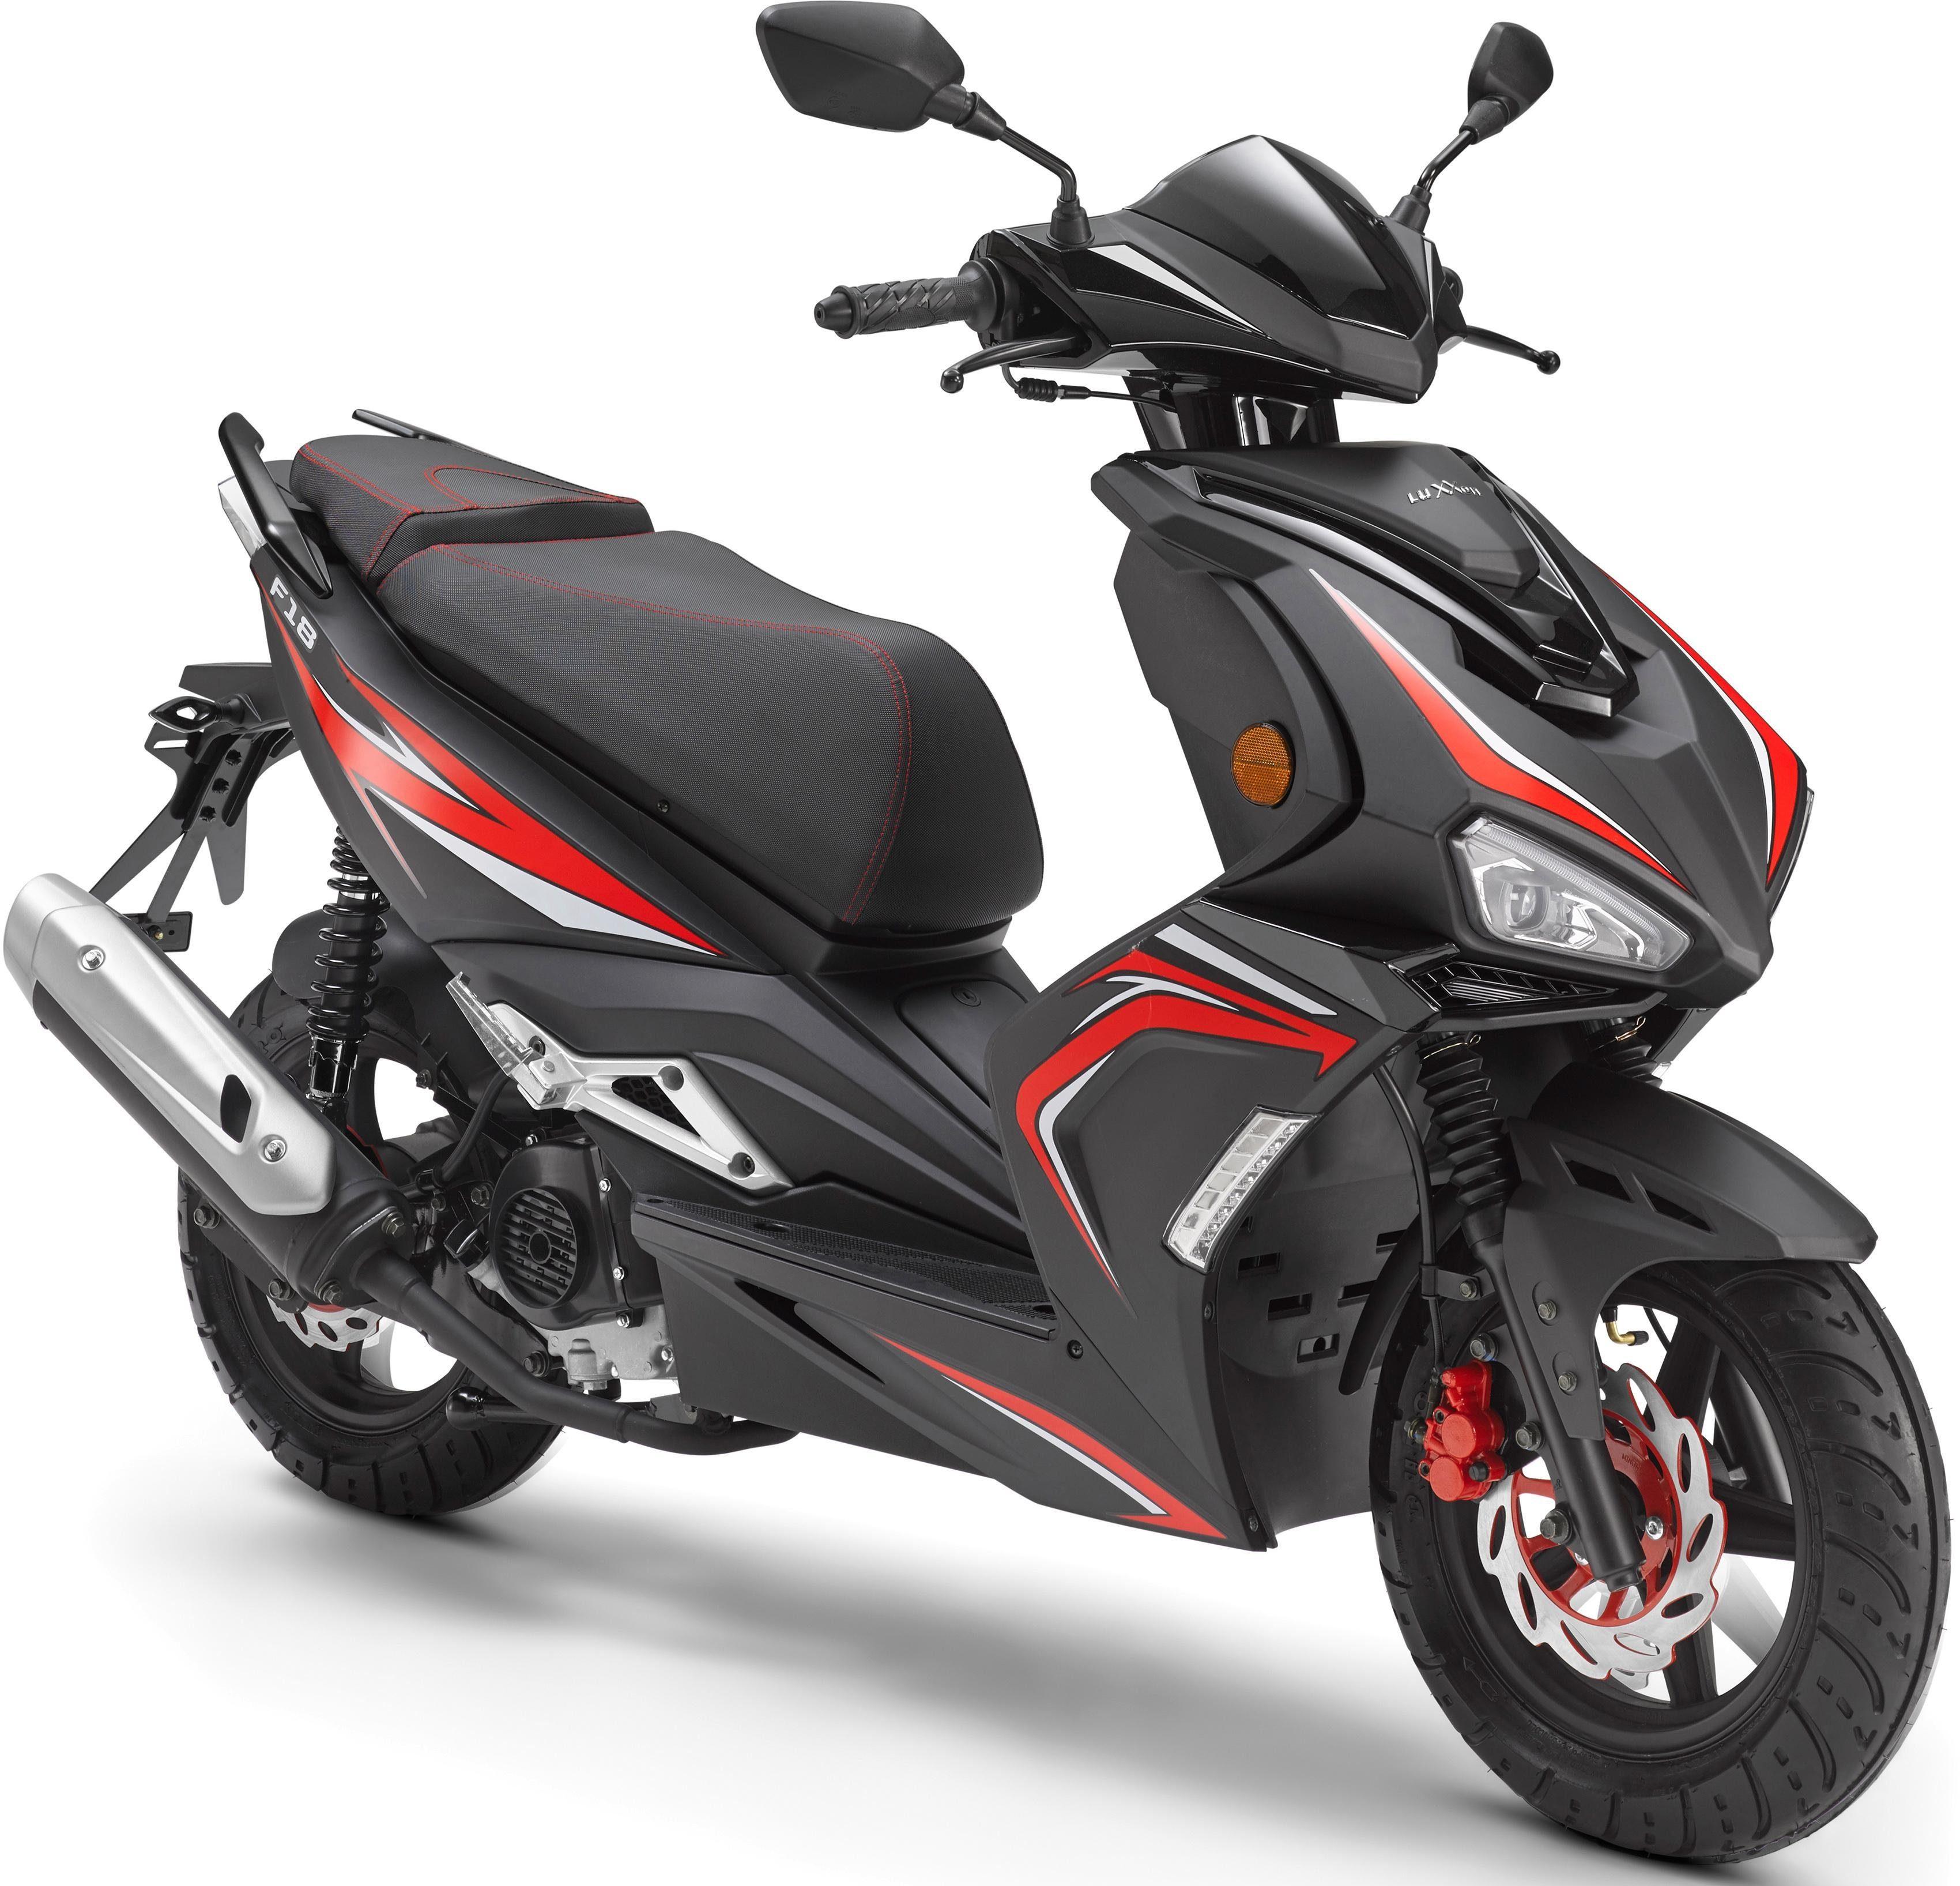 Luxxon Motorroller »F18 45«, 49 ccm, 45 km/h, Euro 4